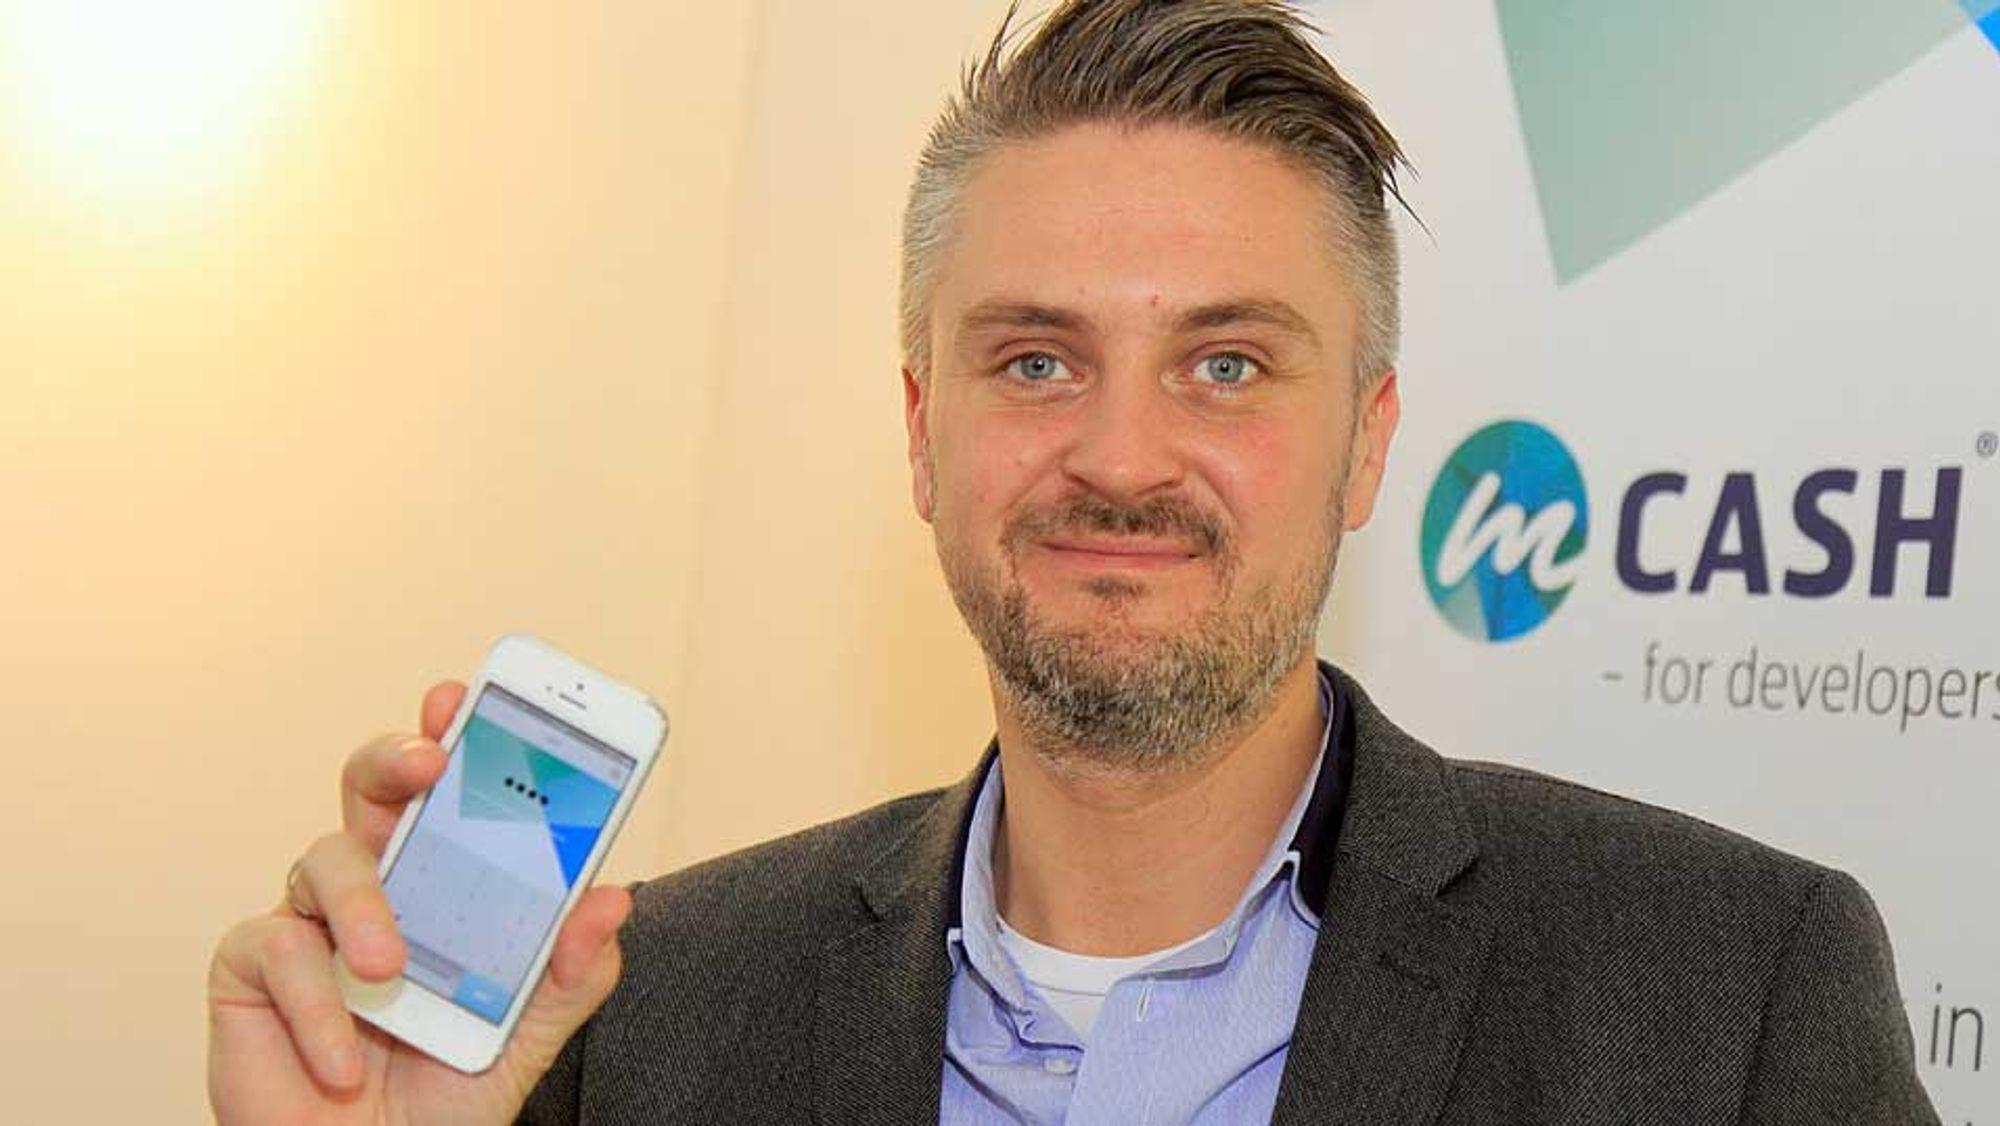 Daniel R. Döderlein er gründer, administrerende direktør og styreformann i mCash. (Foto: Kurt Lekanger, Mobilen.no)